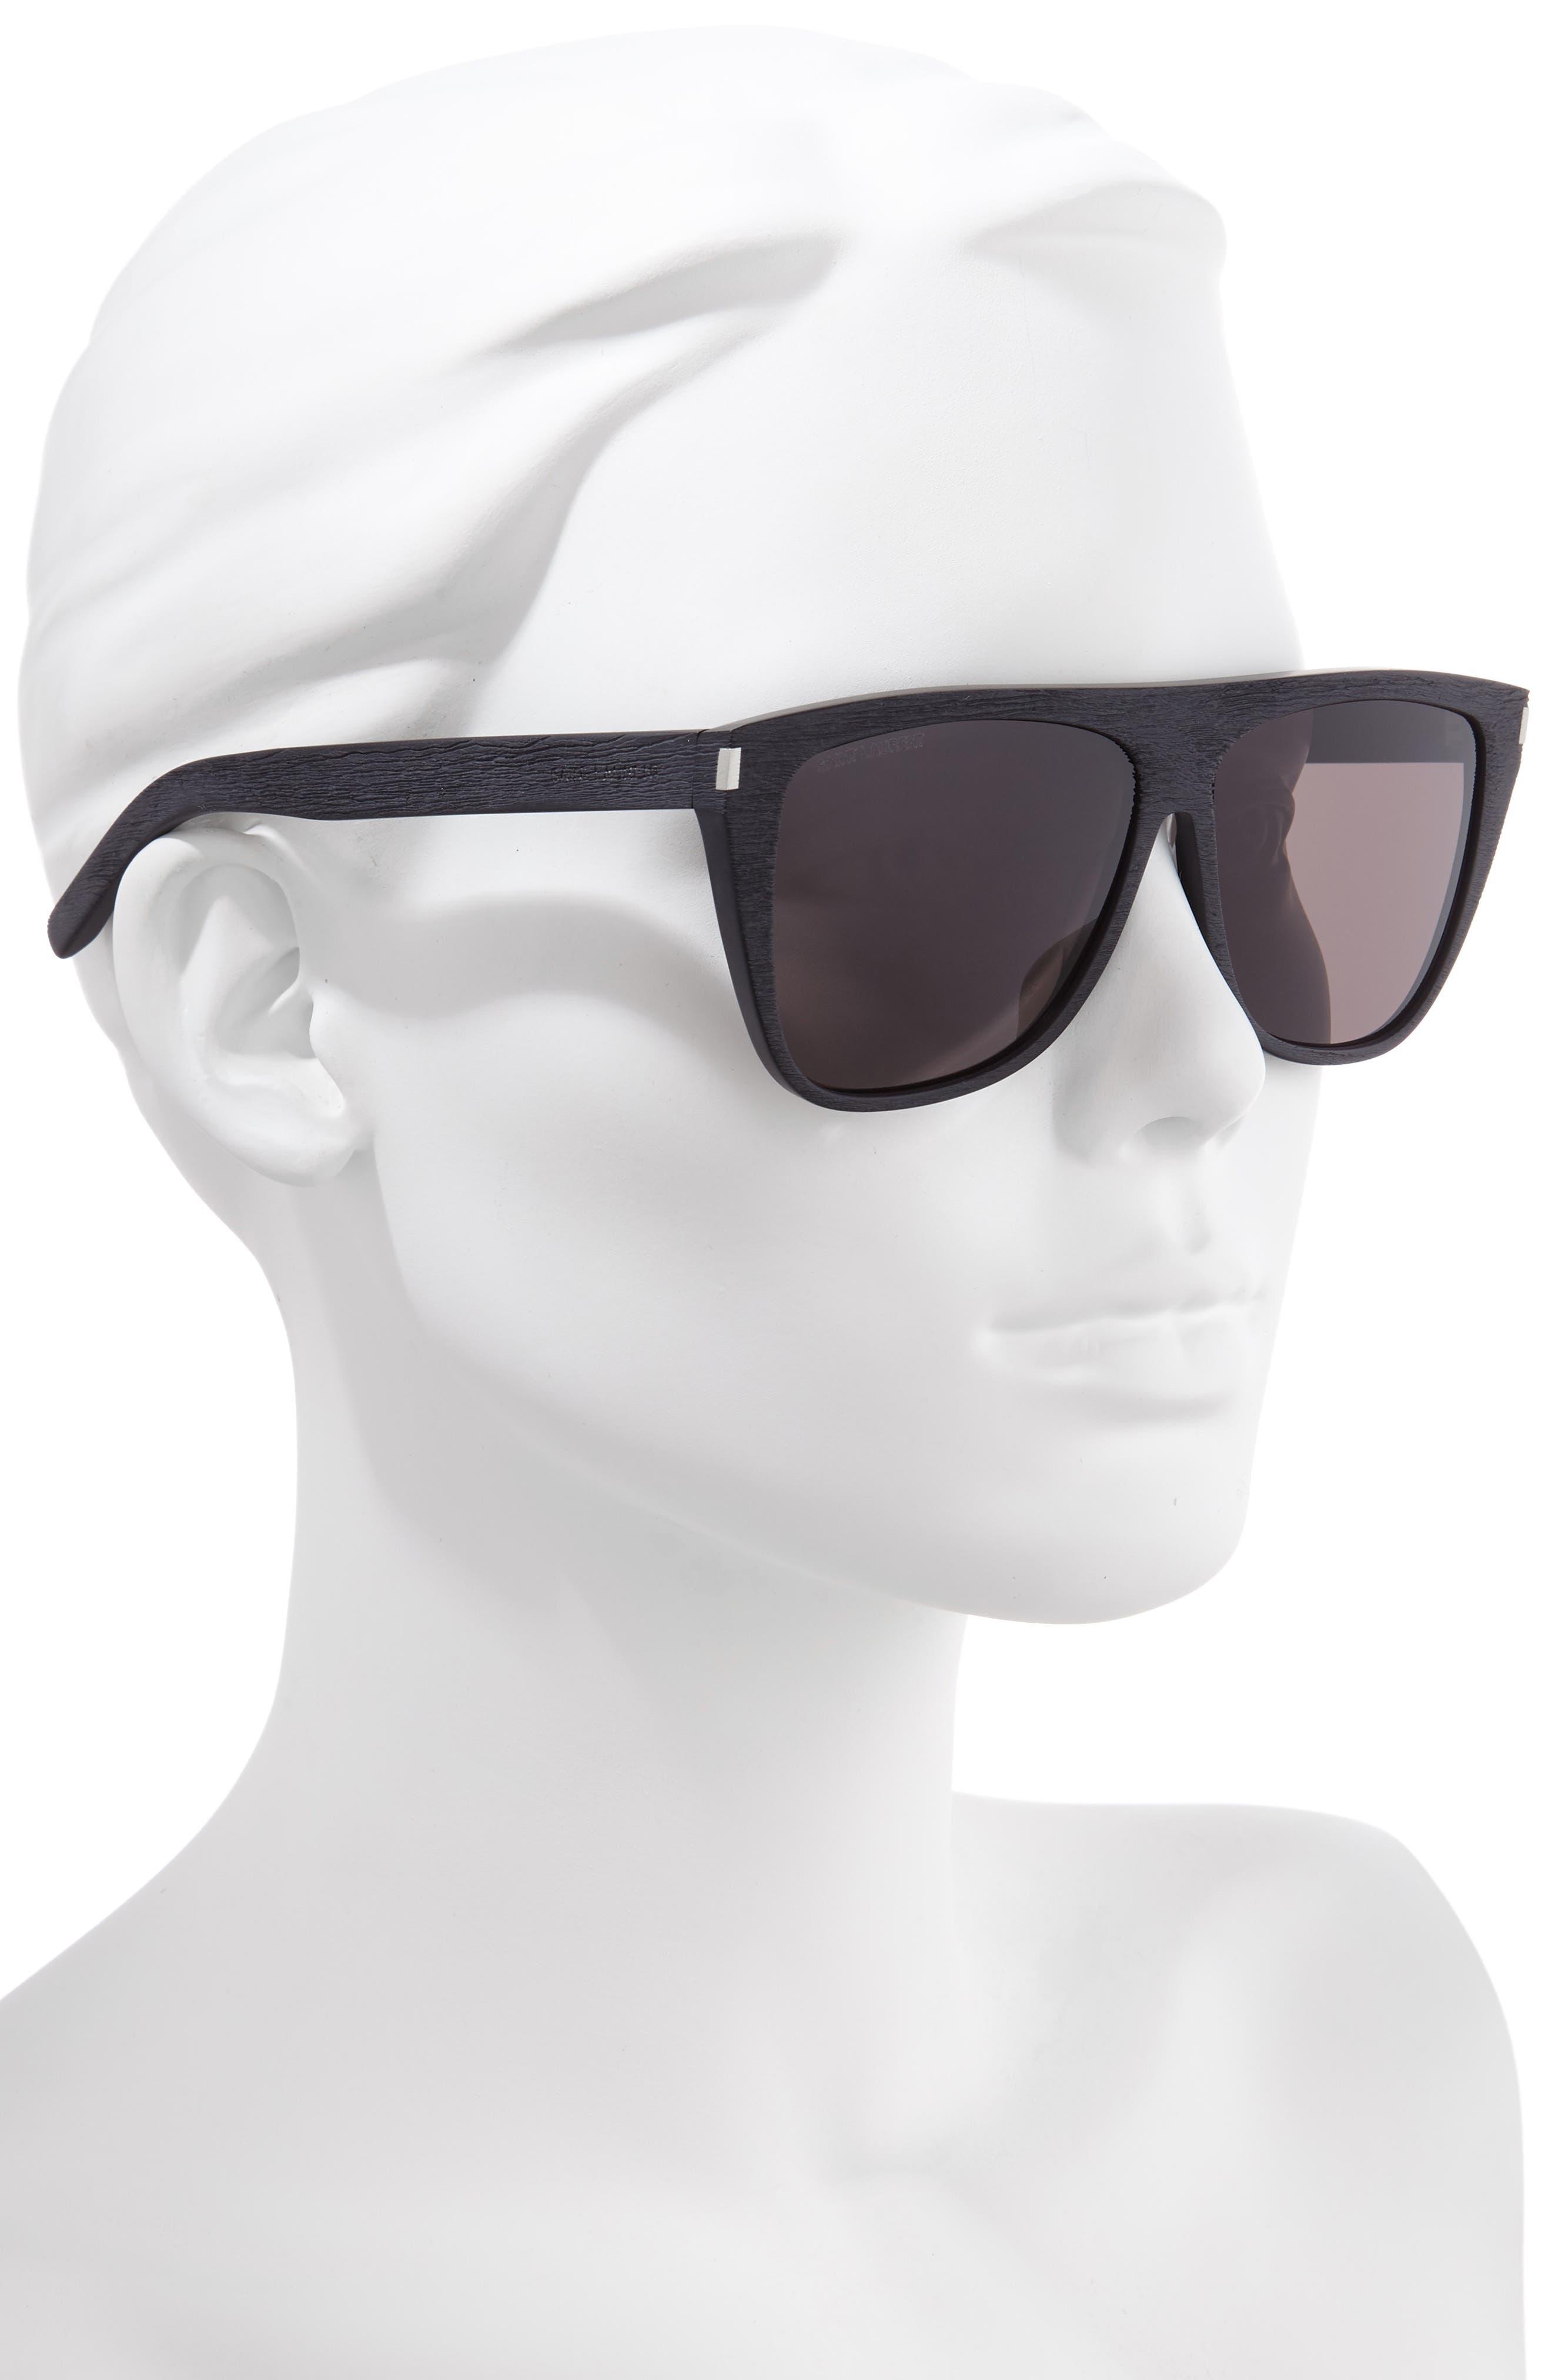 SAINT LAURENT, 59mm Sunglasses, Alternate thumbnail 2, color, WOOD EFFECT BLACK/ GREY SOLID